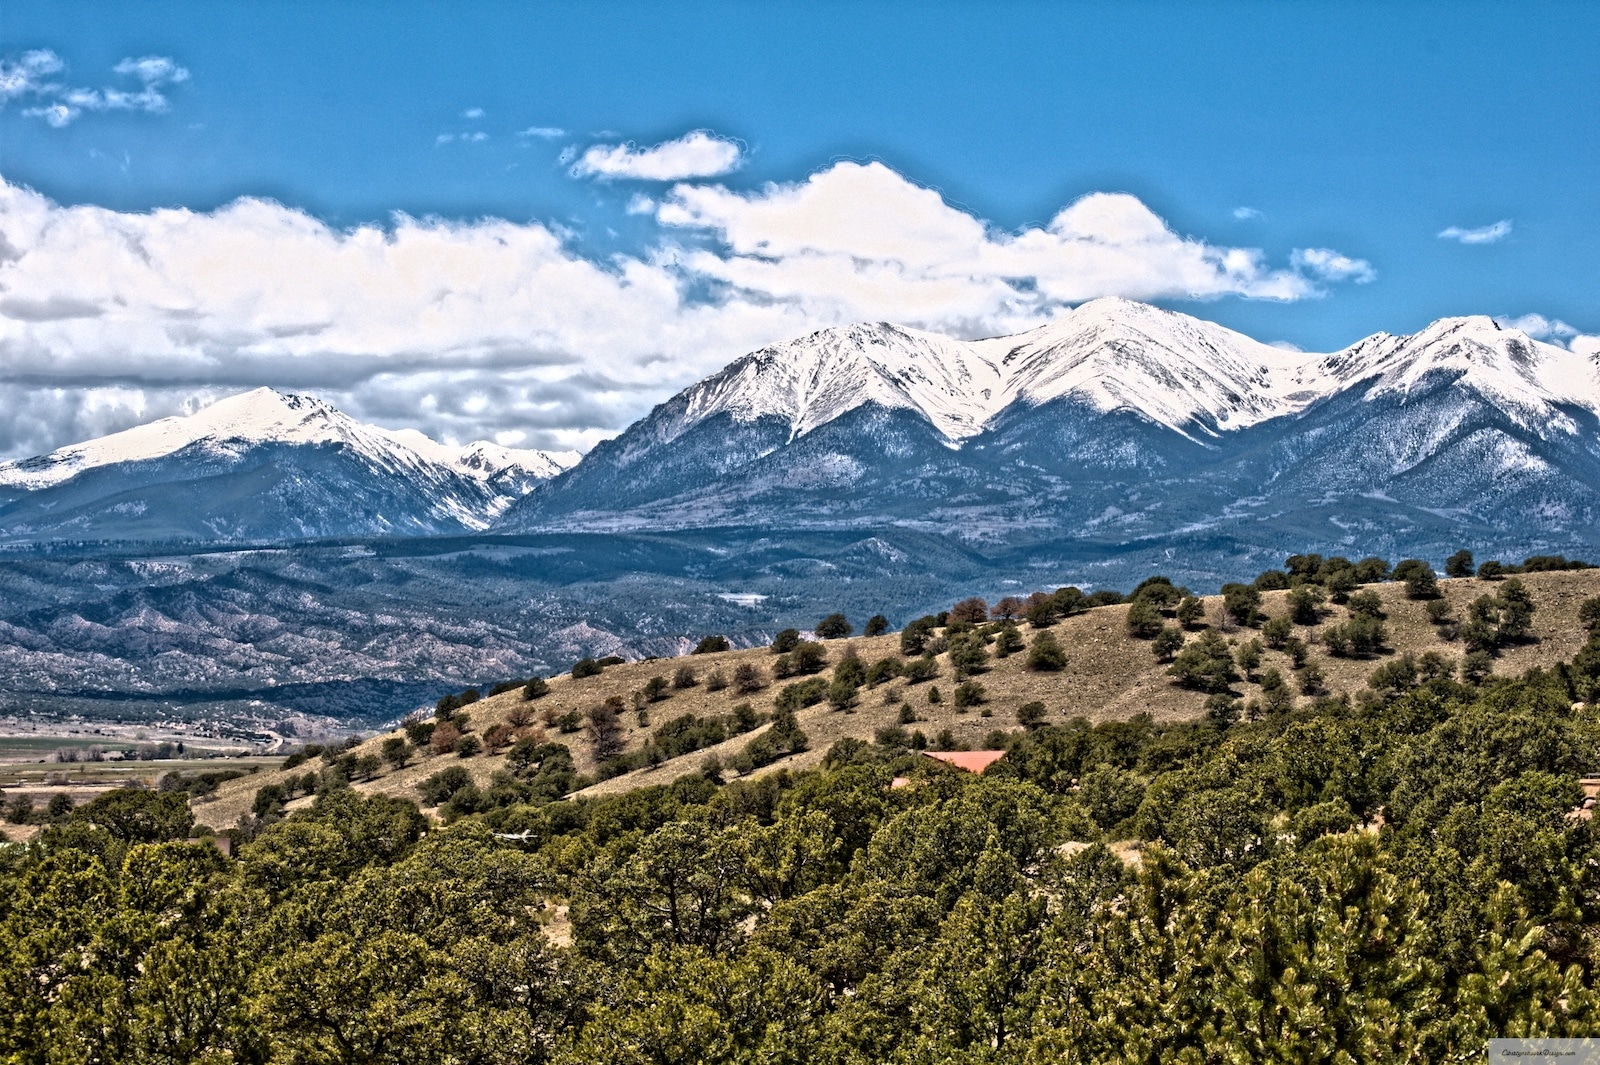 Sawatch Range 14ers Salida Colorado